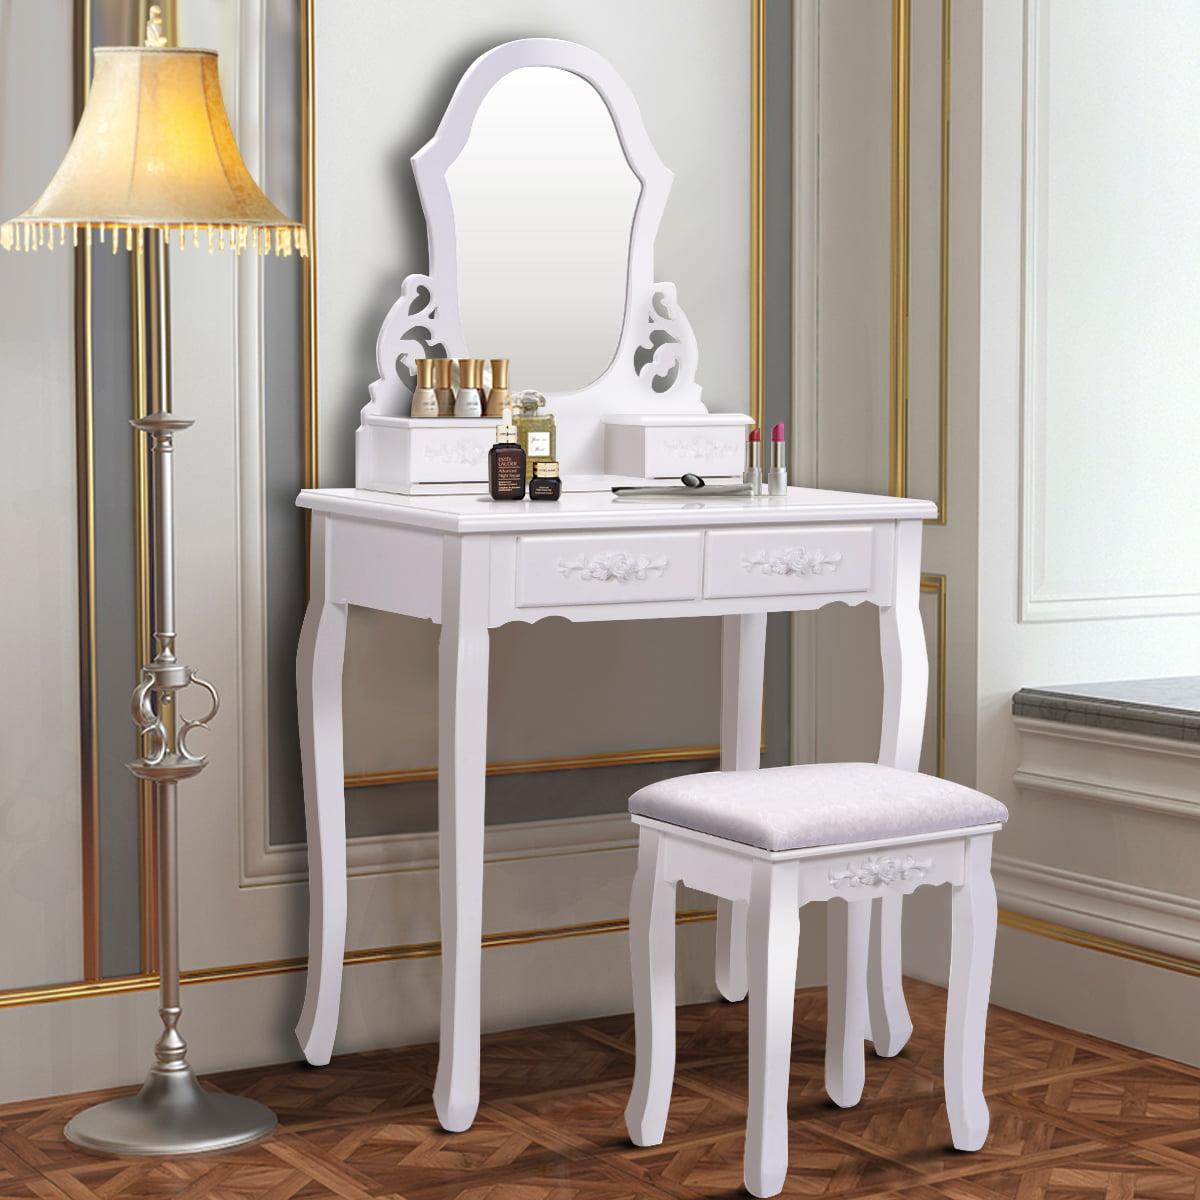 Costway White Vanity Jewelry Wooden Makeup Dressing Table Set bathroom  W/Stool Mirror & 4 Drawer